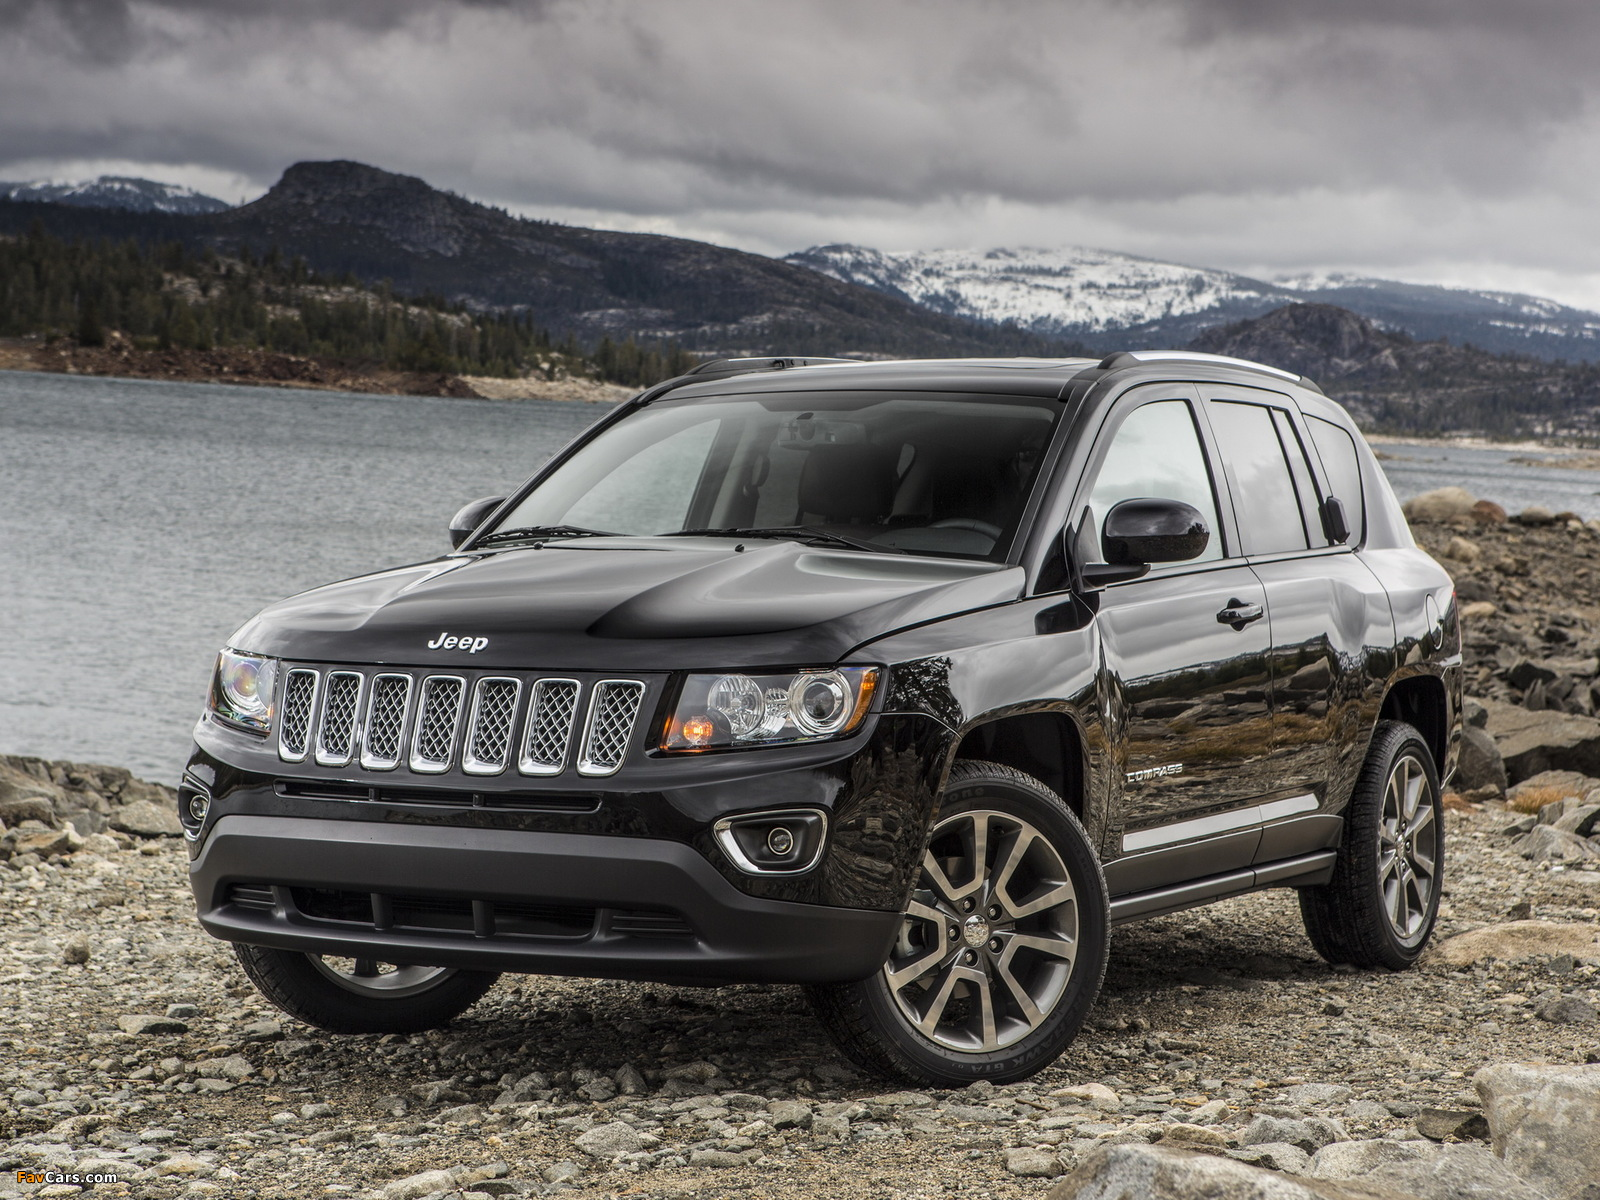 Jeep Compass 2013 photos (1600 x 1200)